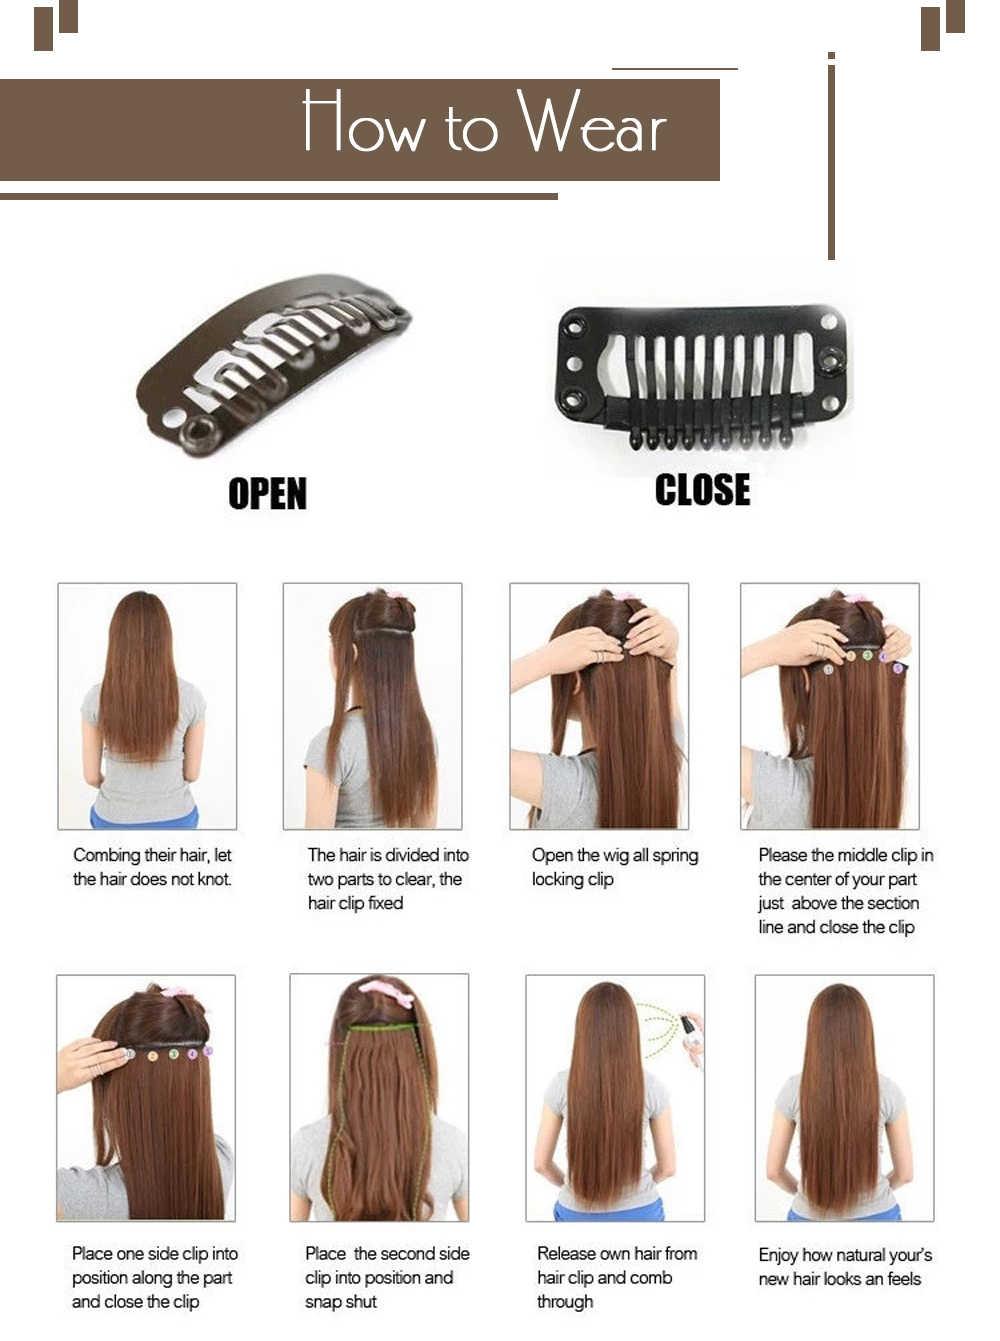 Moresoo קליפ שיער טבעי תוספות שיער הארכת מכונה רמי גולת כותרת ombre צבע 7 חתיכות 120 גרם\אריזה שיער קליפים